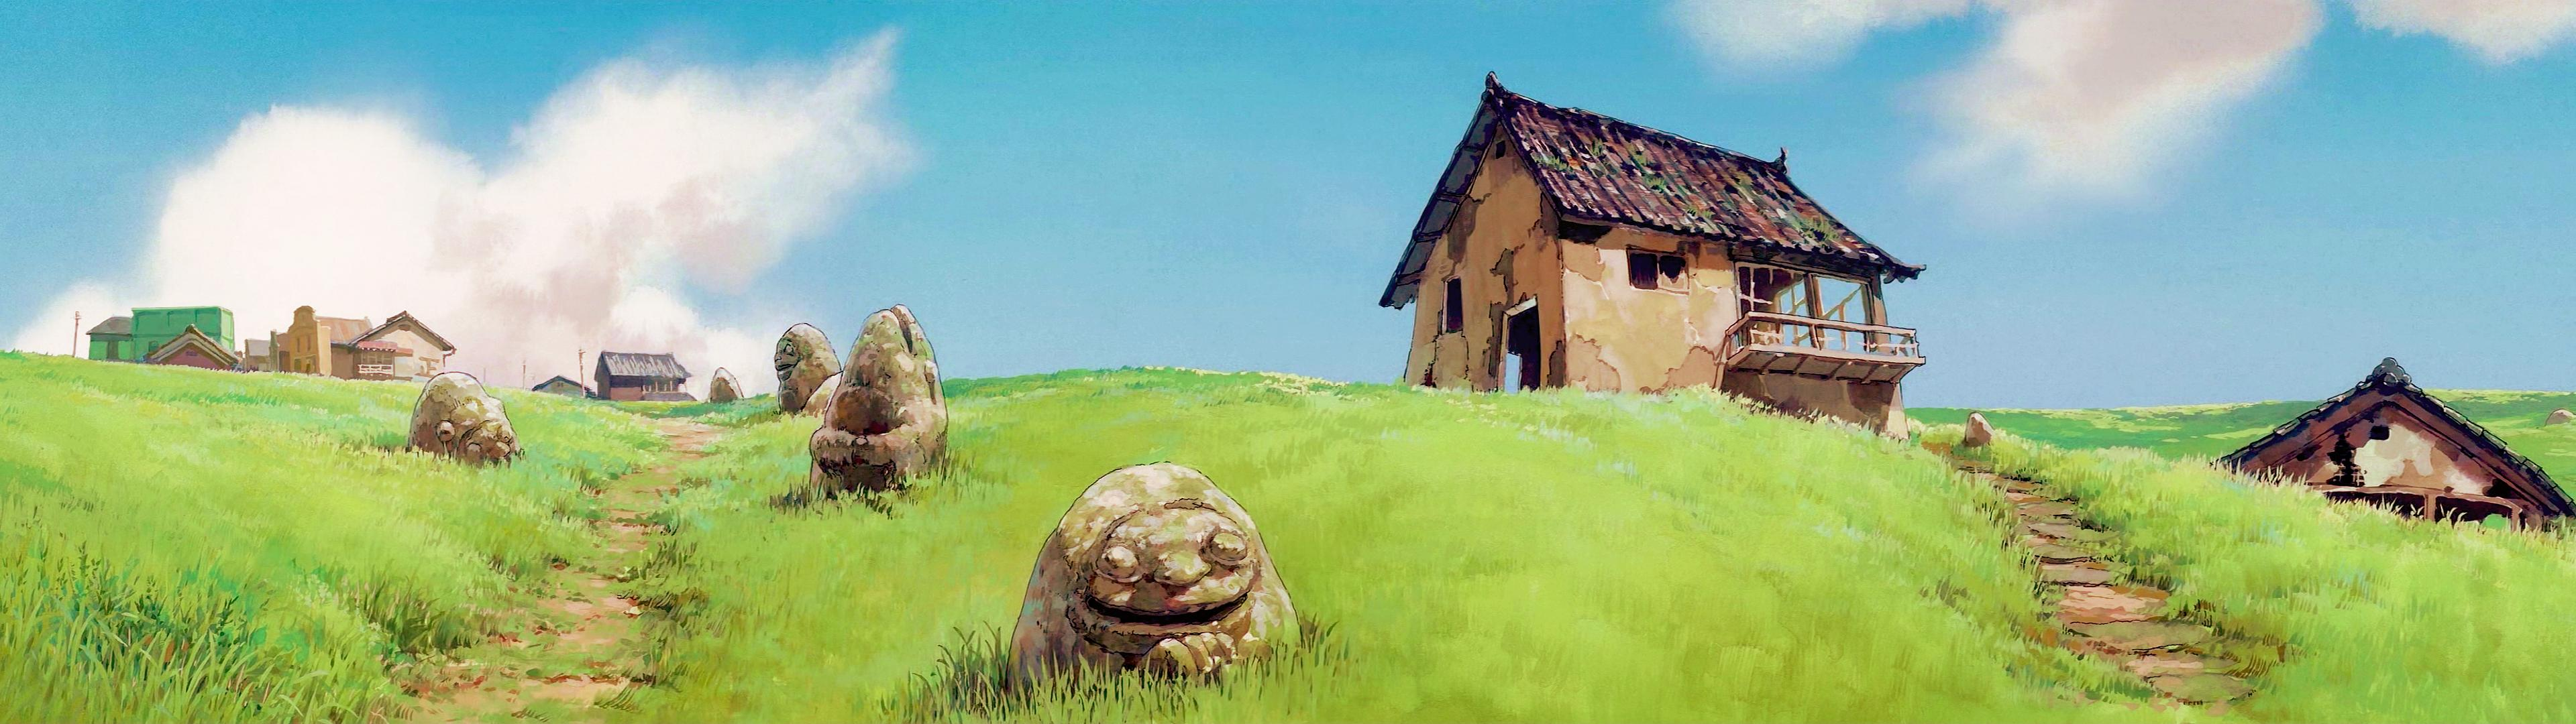 Studio Ghibli 3840 X 1080 Wallpapers   Top Studio Ghibli 3840 3840x1080